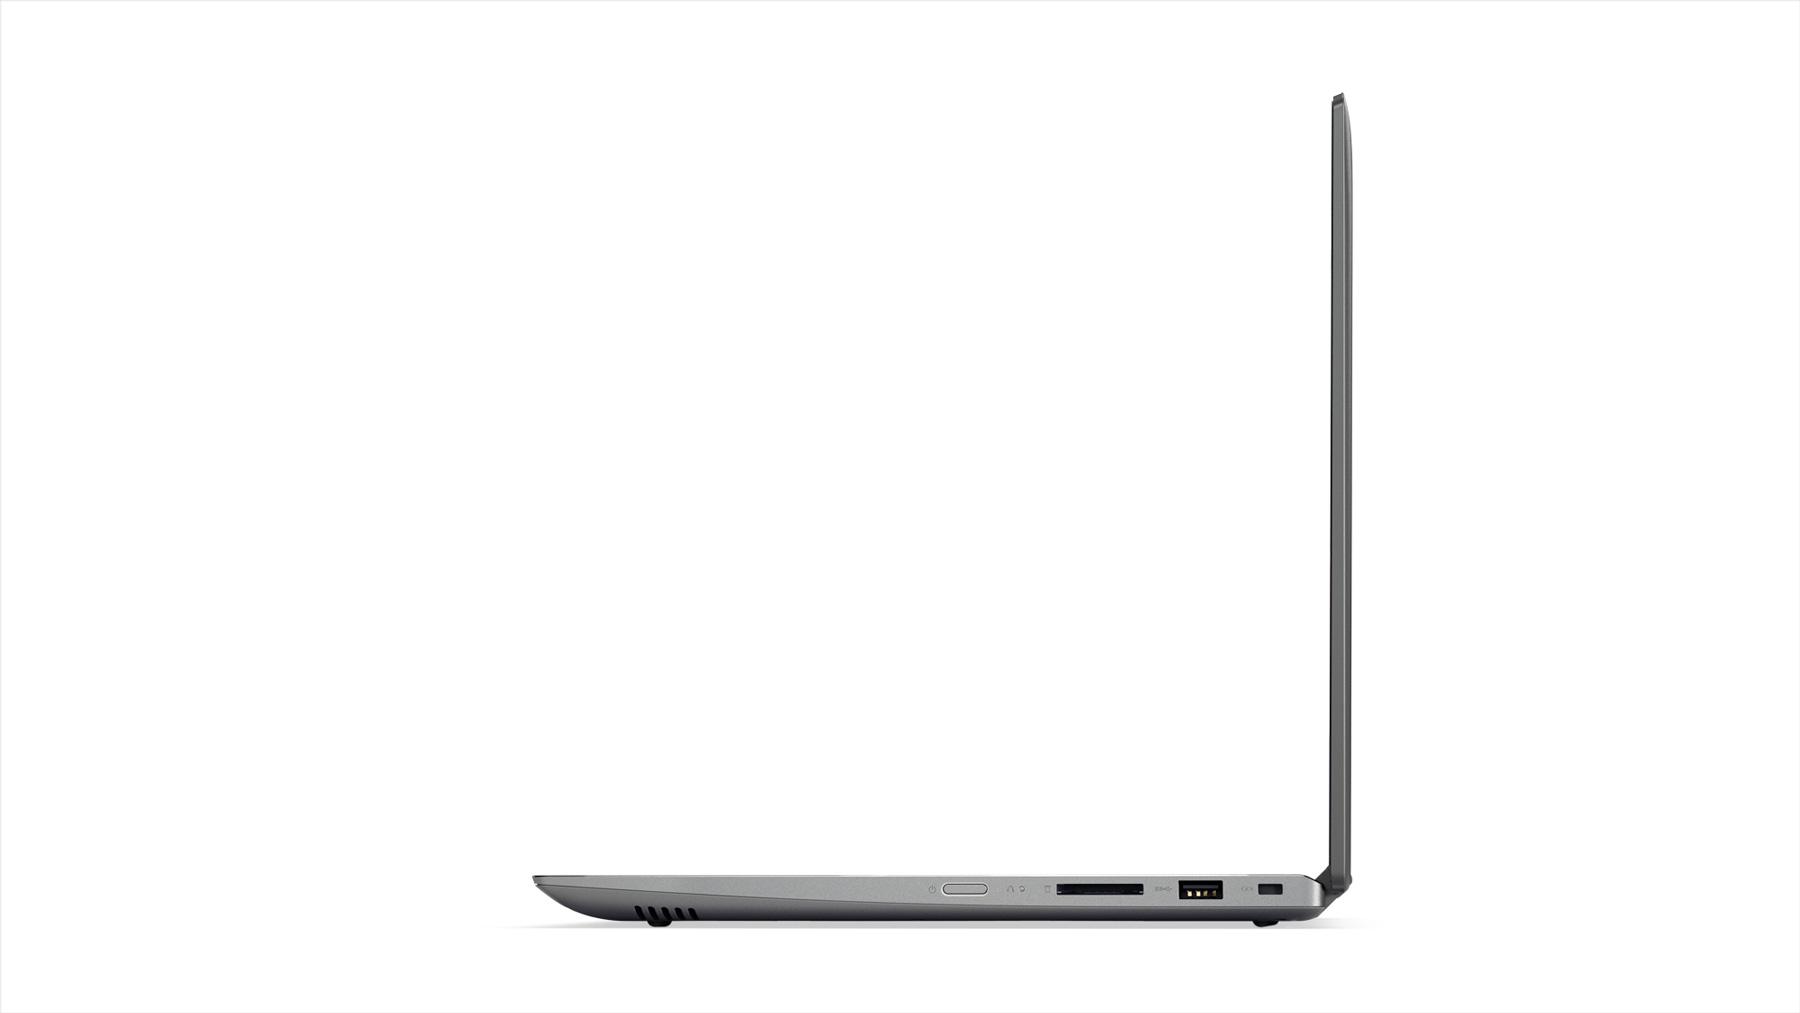 Фото  Ультрабук Lenovo Yoga 520 Mineral Grey (81C800CVRA)